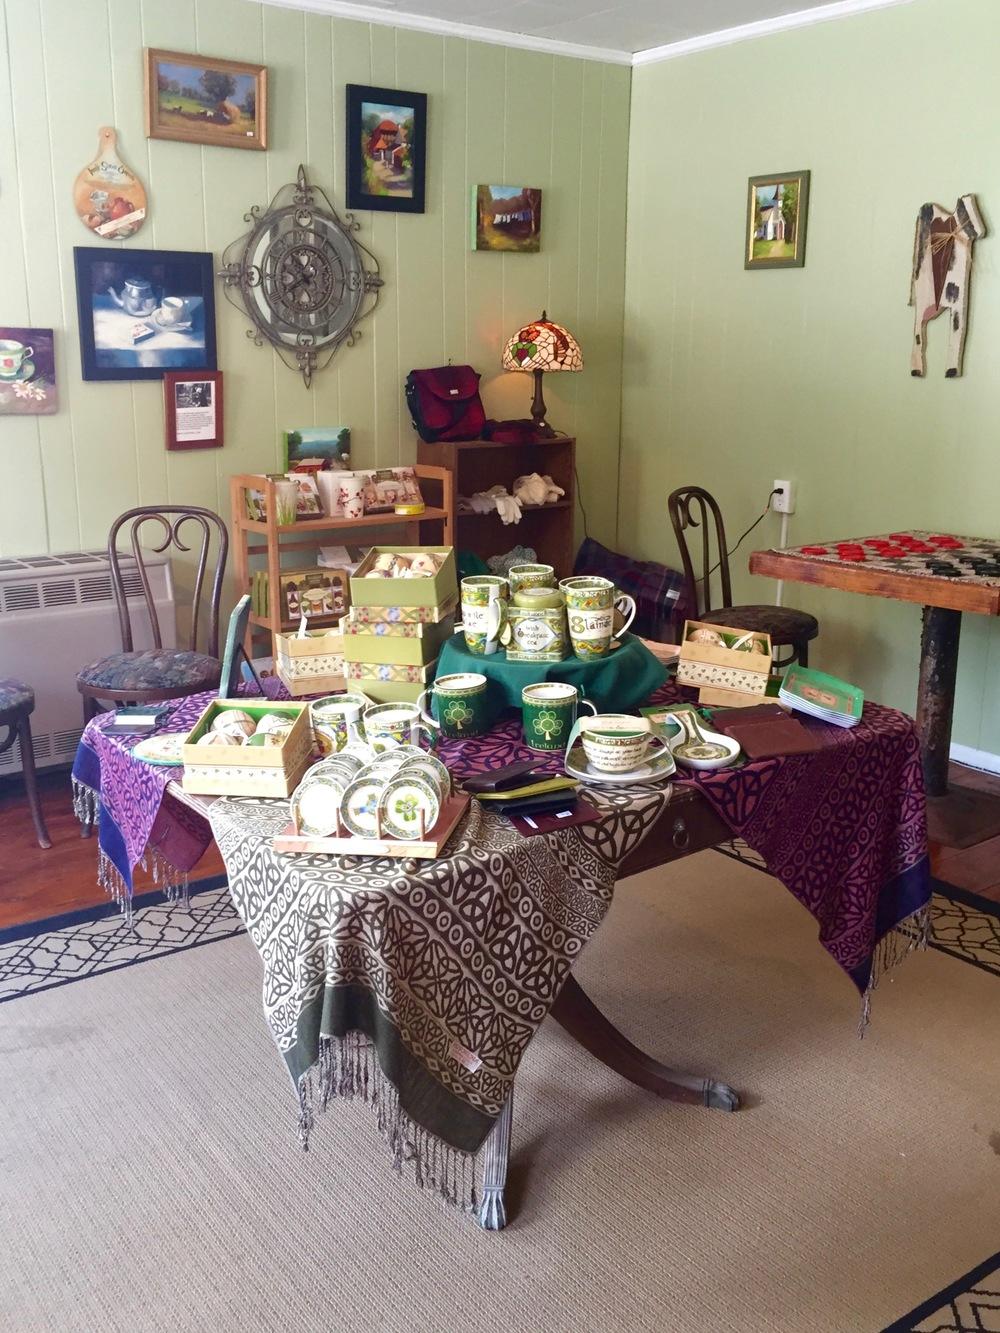 Irish Tea Shop in East Durham, NY | BrooklynDoubleWide.com